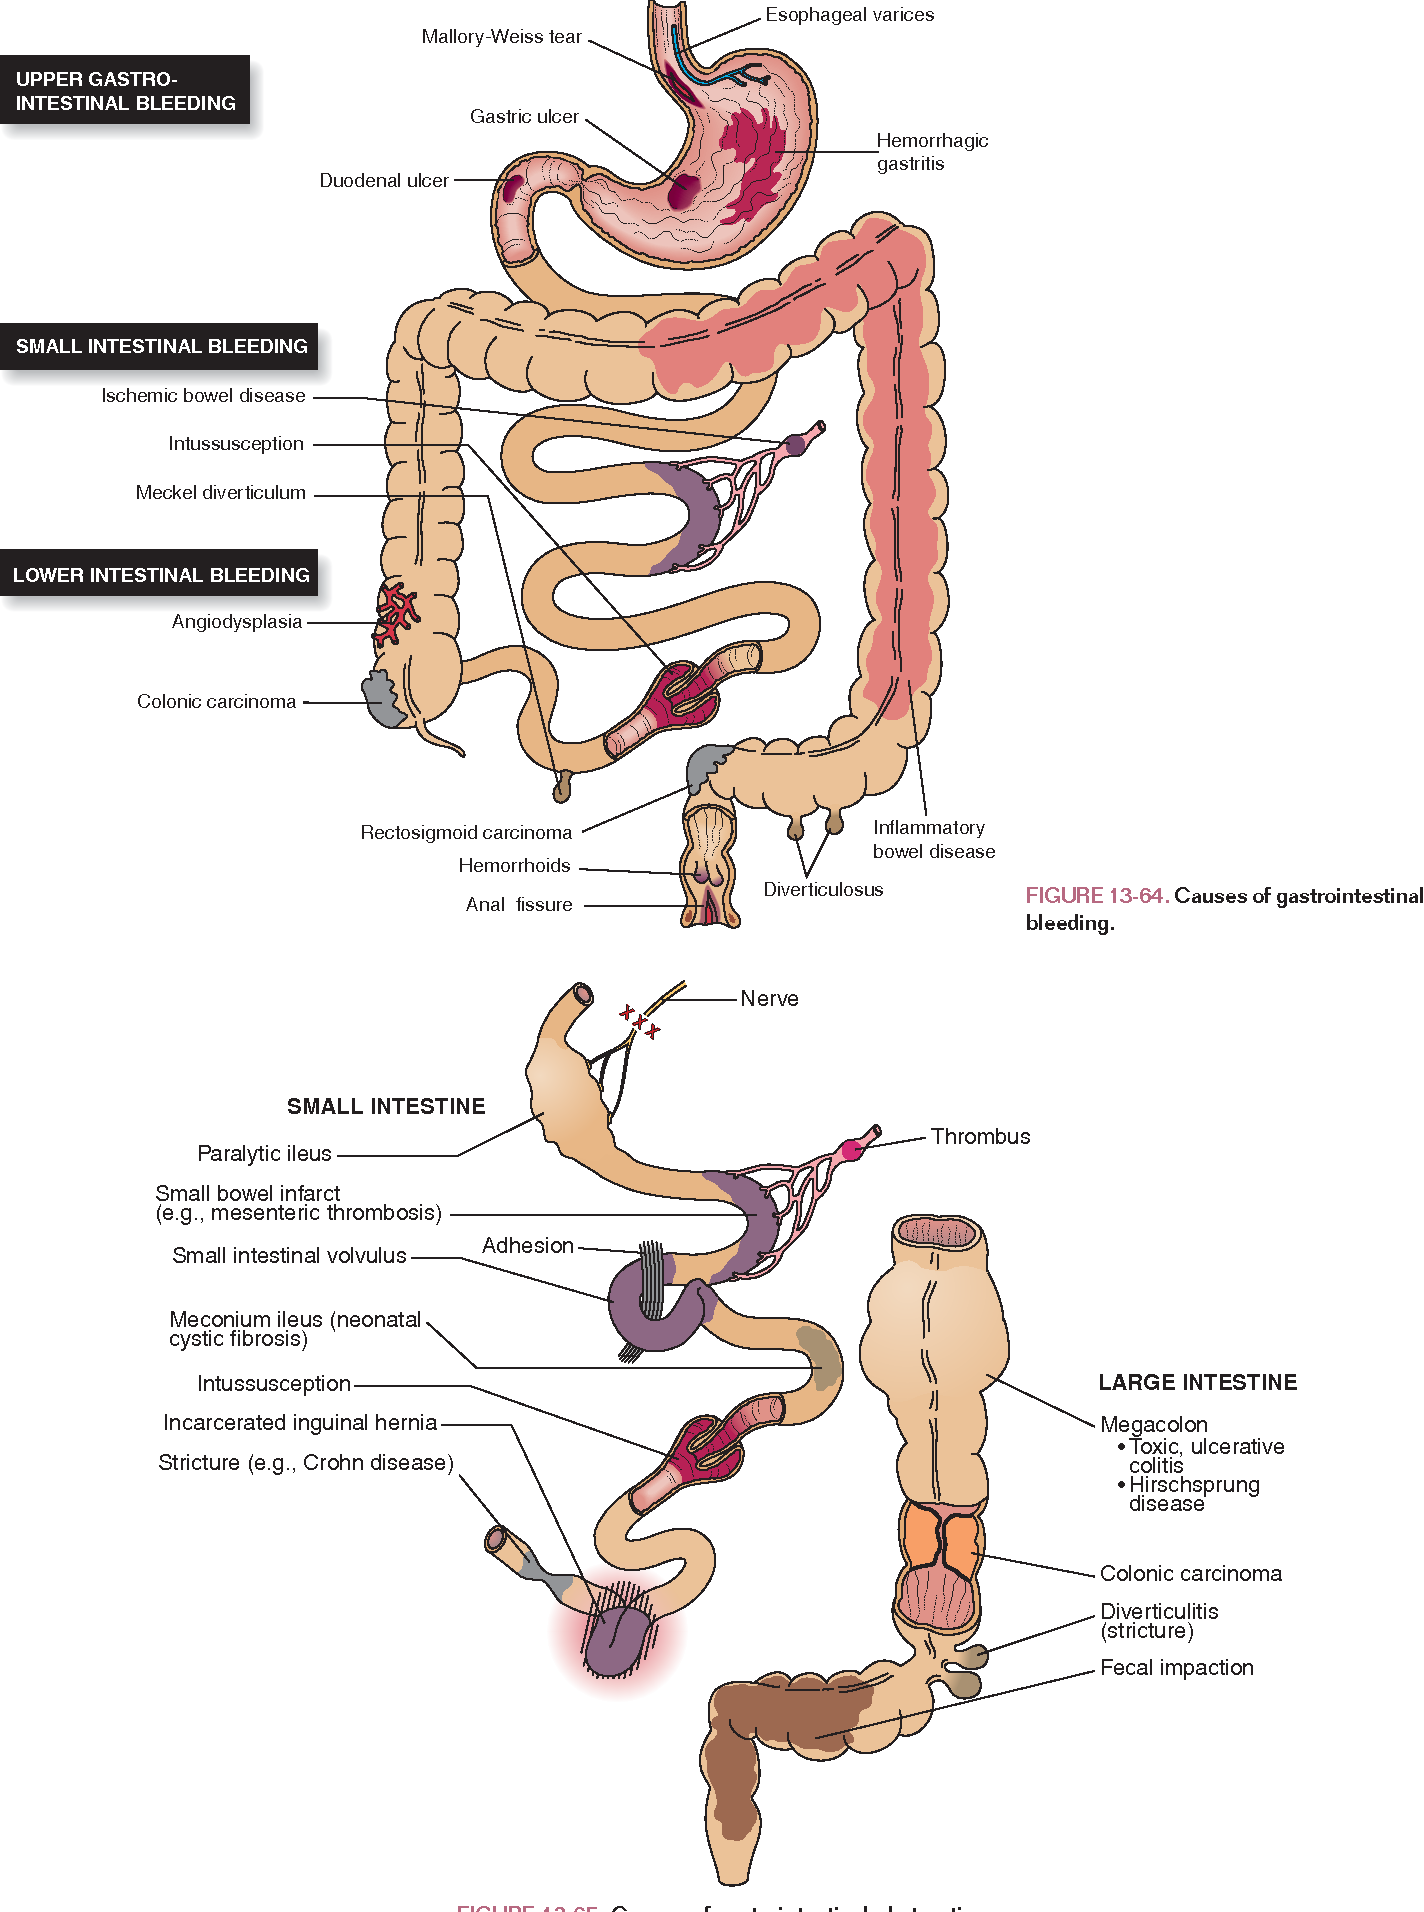 The Gastrointestinal Tract - Semantic Scholar